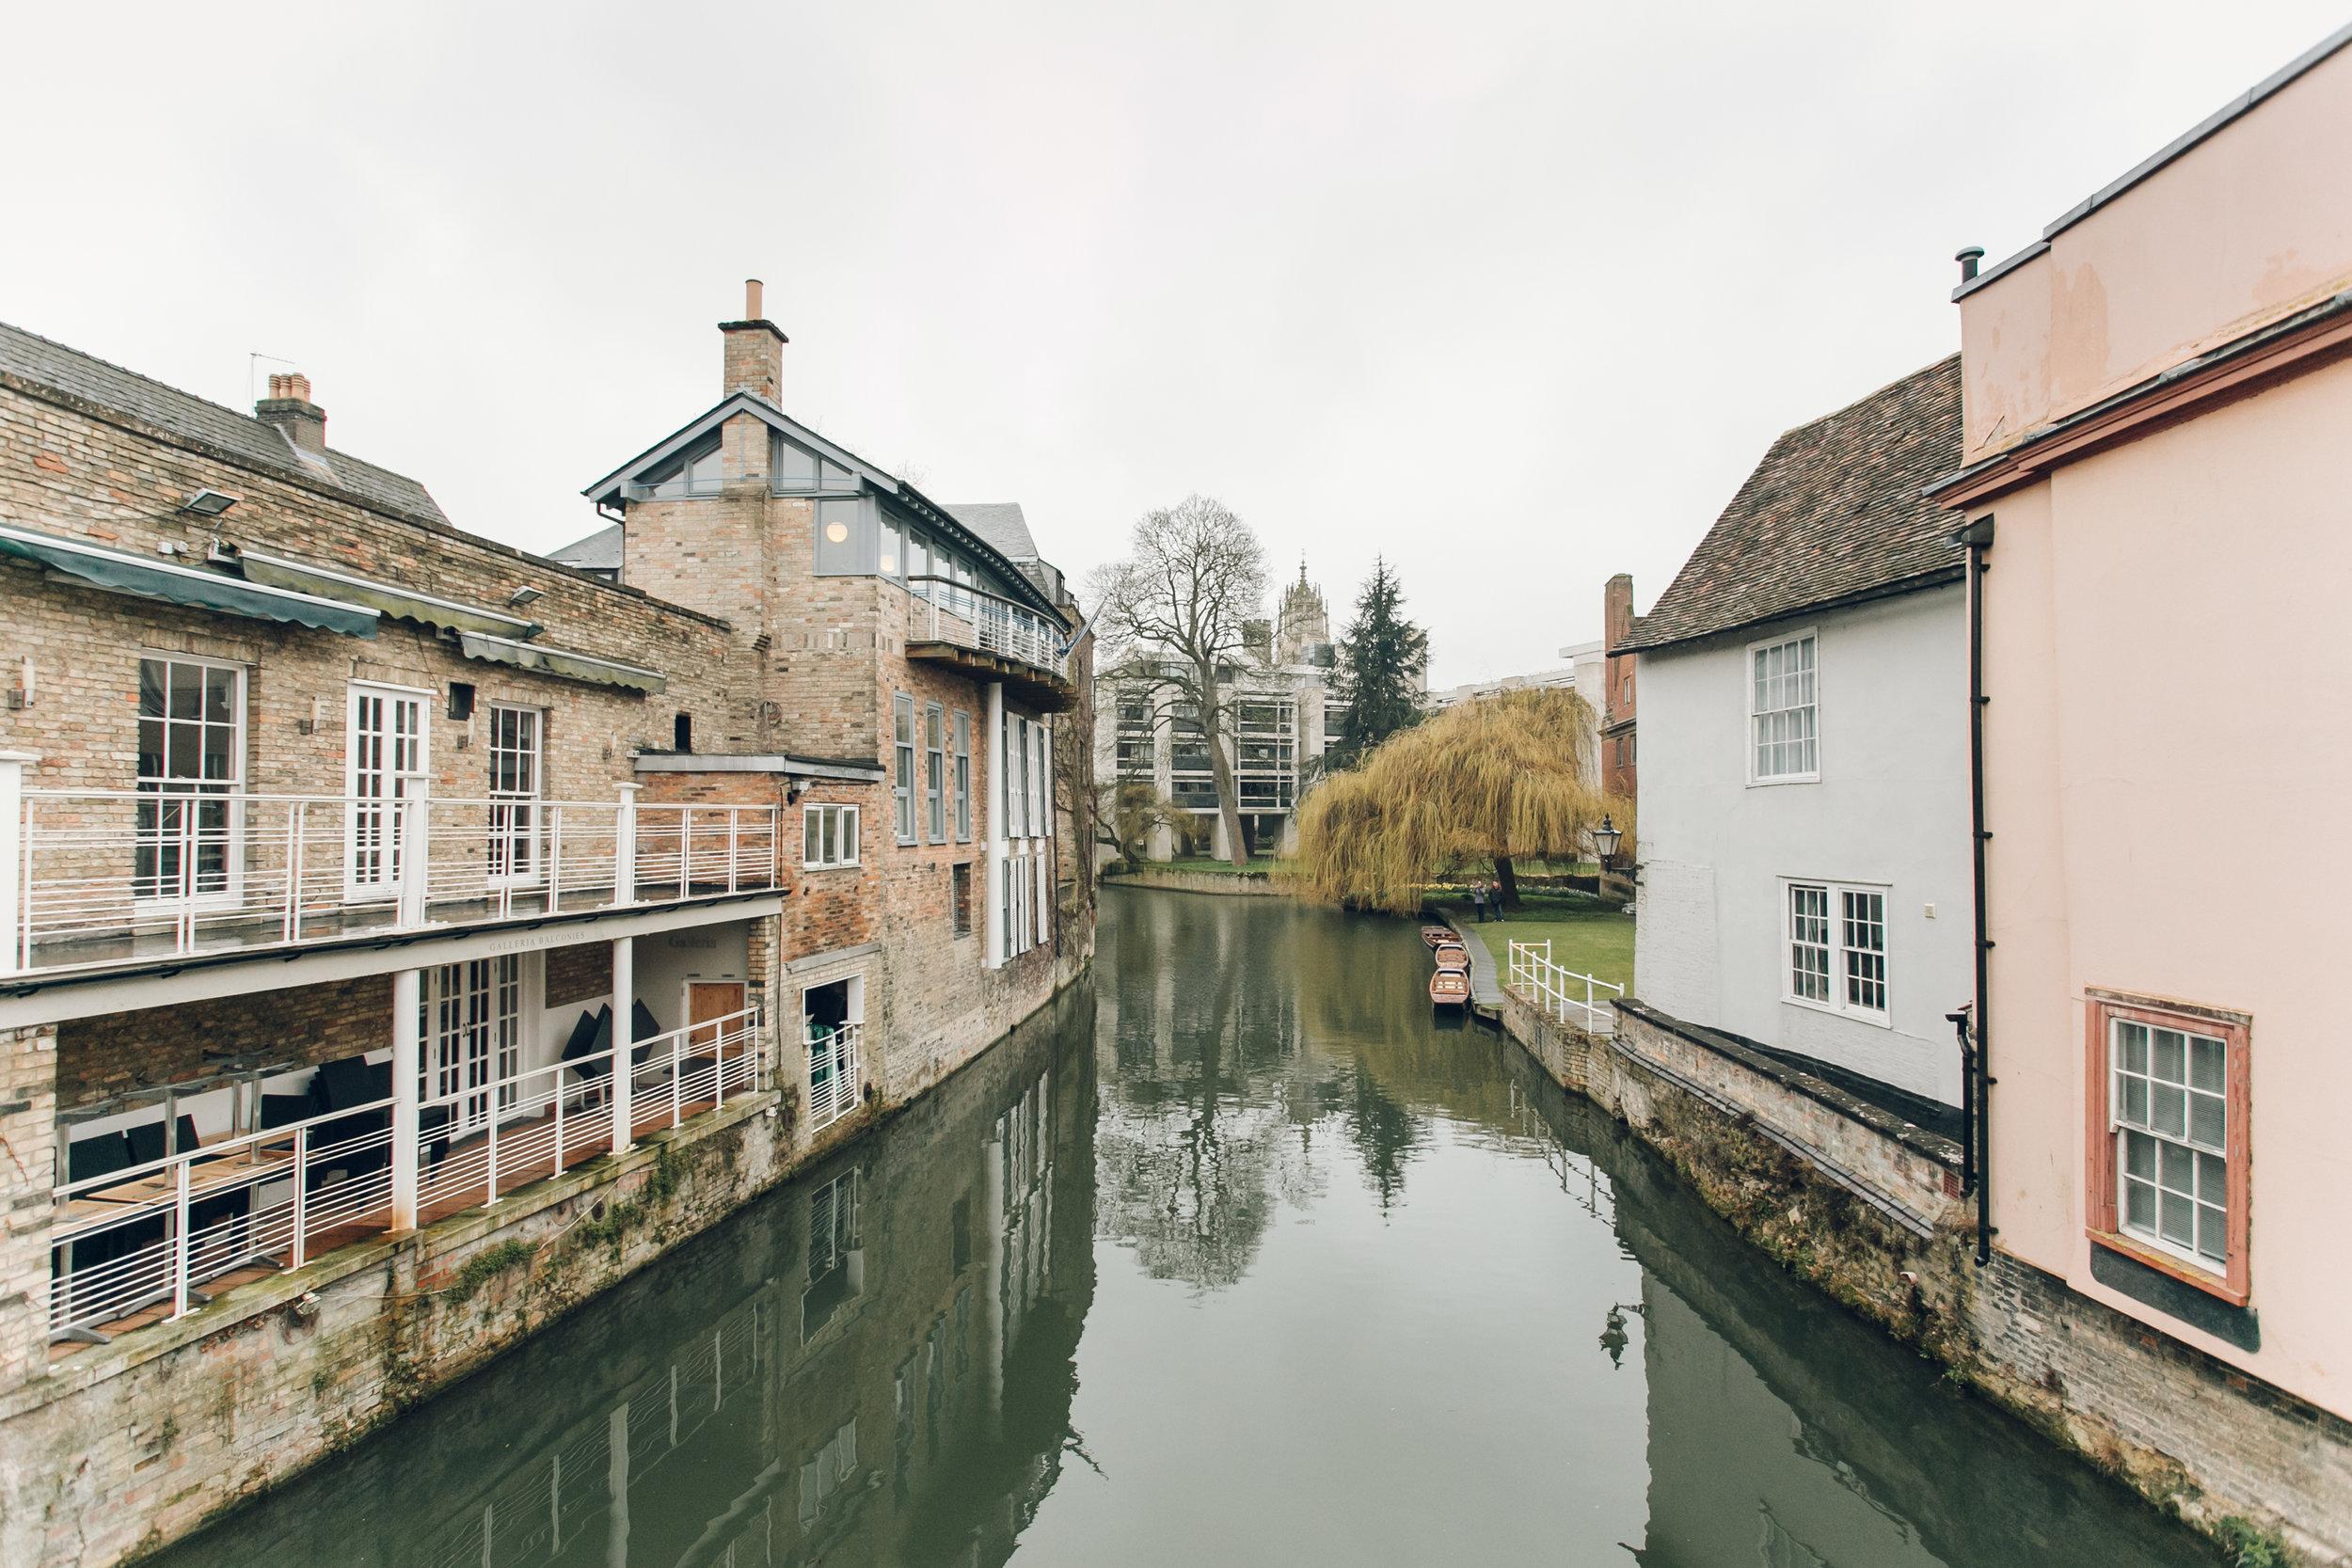 Cambridge (UK), photographed by Haarkon